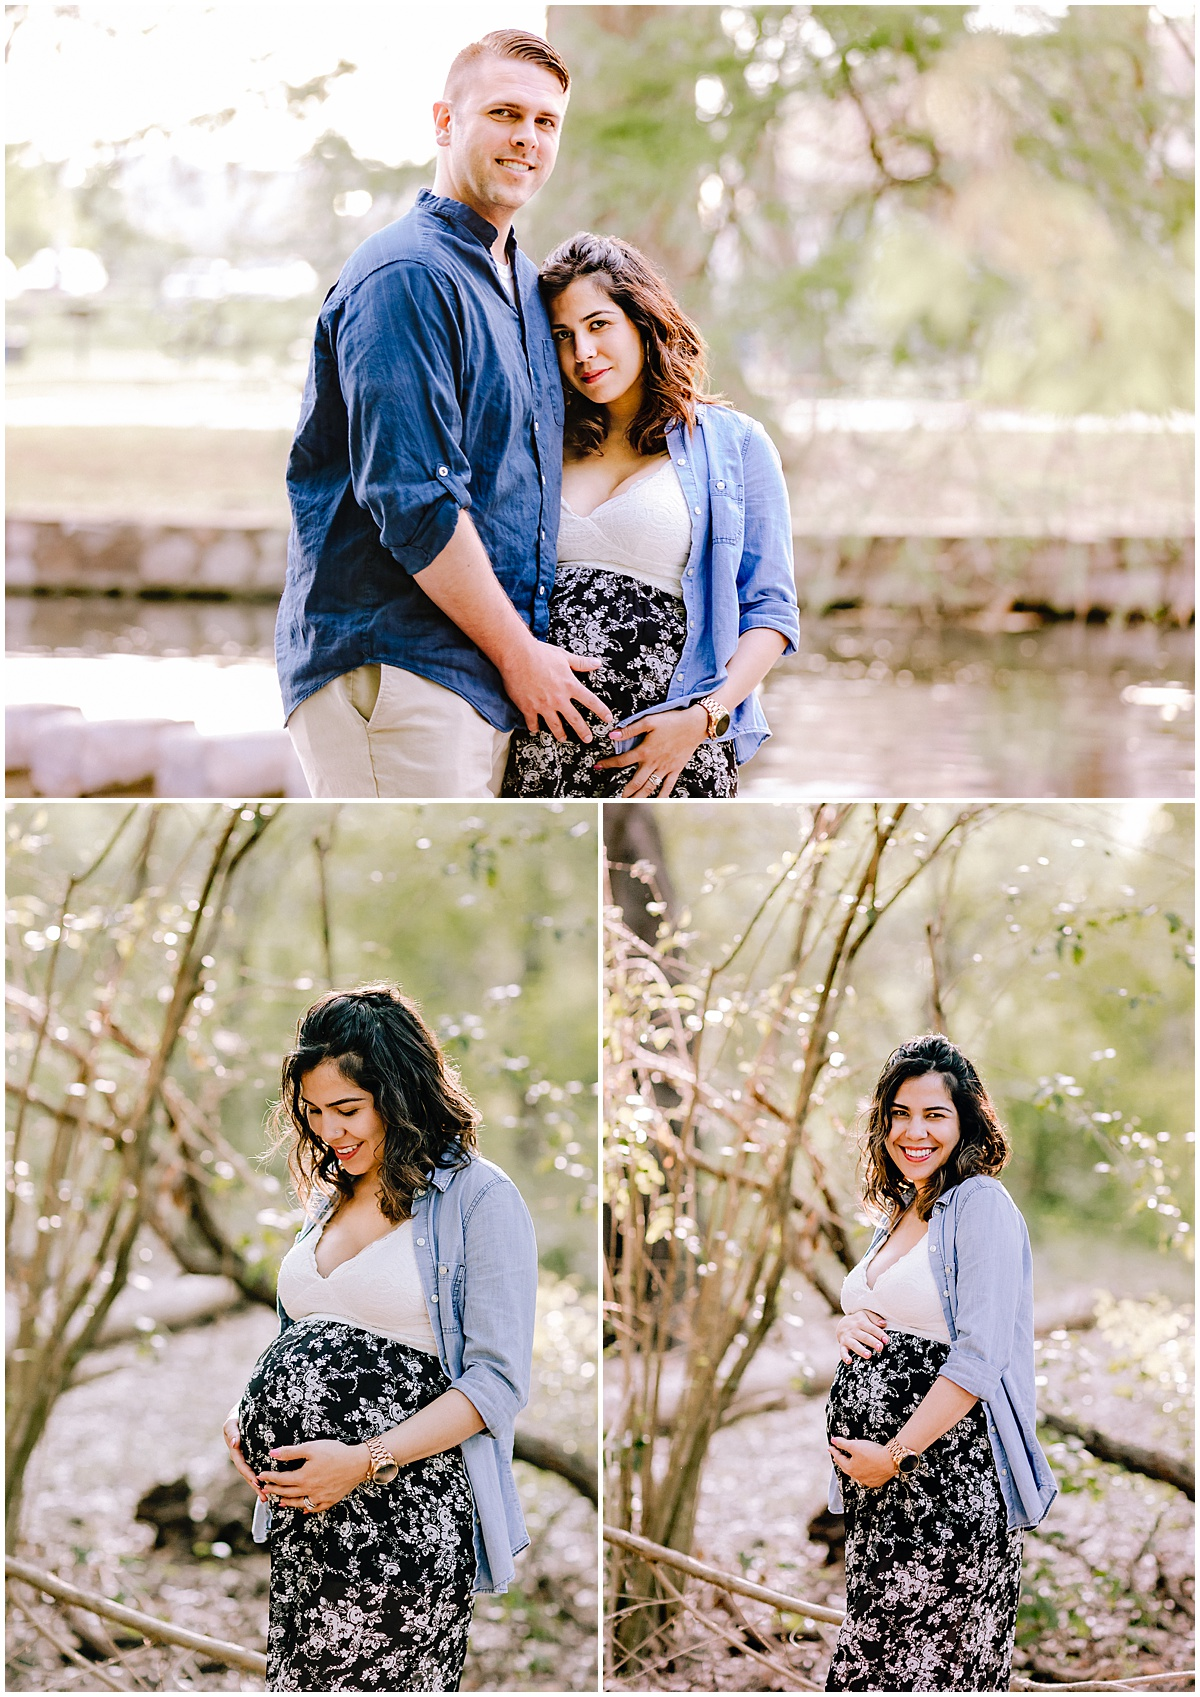 Maternity-Photo-Session-Brakenridge-Park-San-Antonio-Texas-Carly-Barton-Photography_0003.jpg